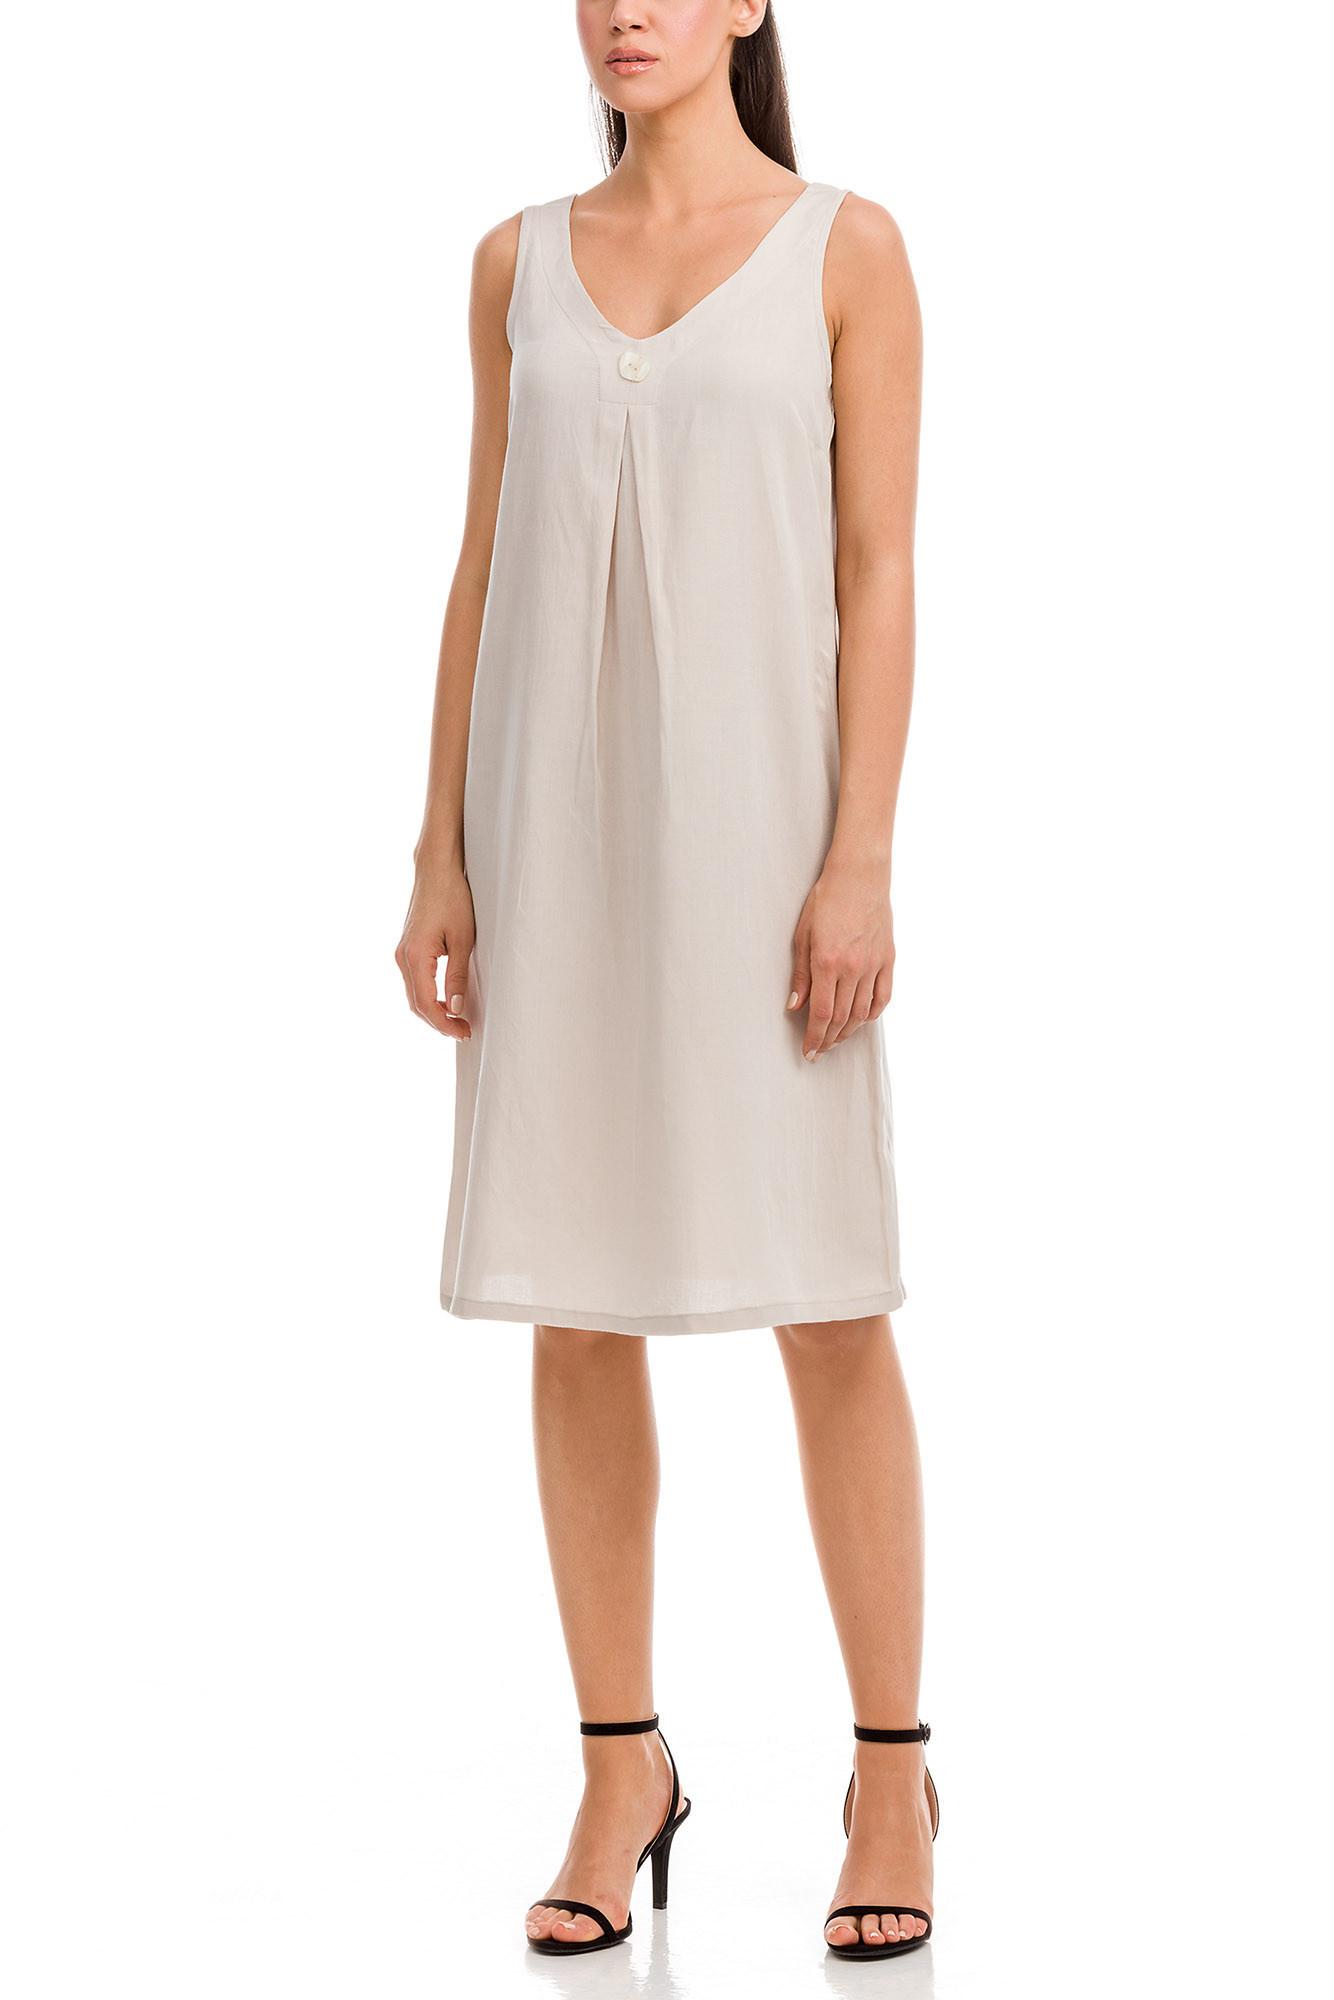 Vamp - Dámske šaty 12585 - Vamp beige peach xxl